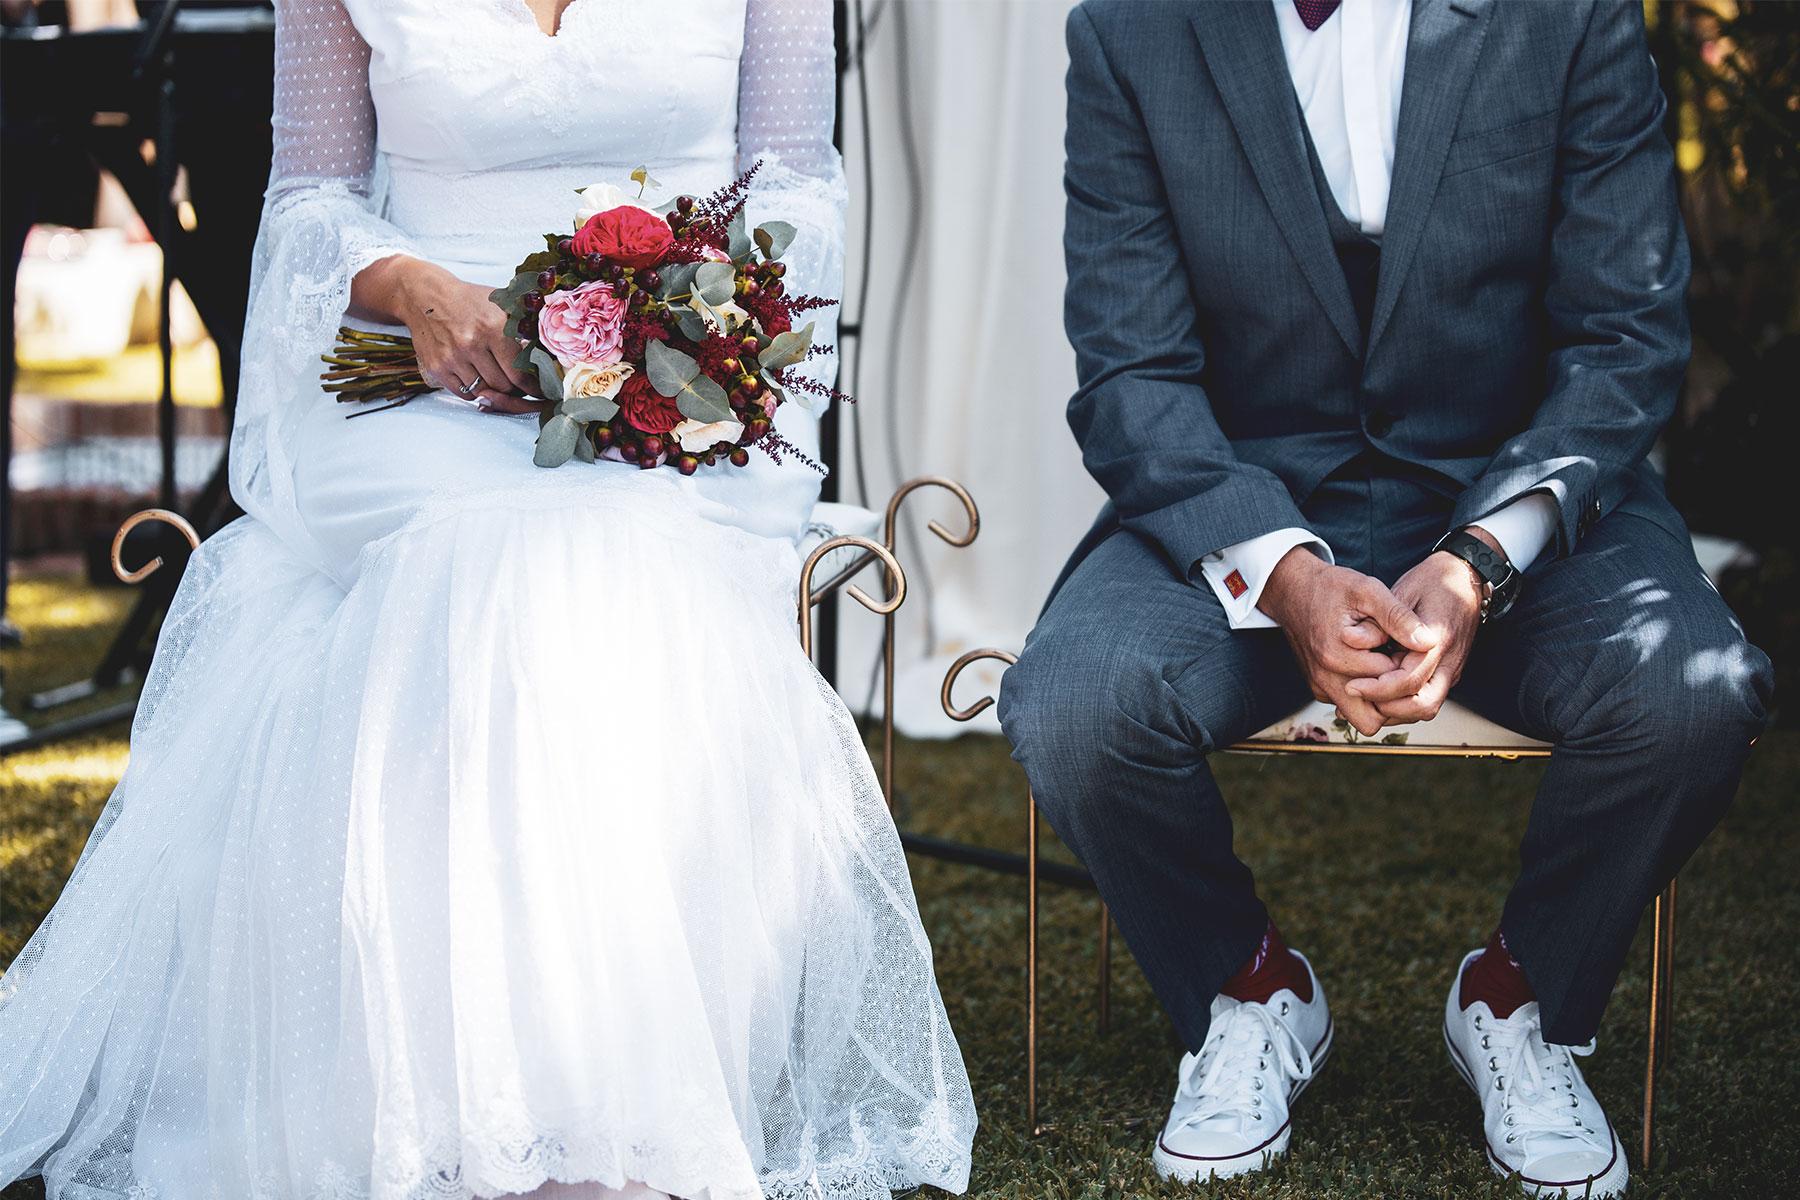 Fotografo de bodas en Málaga, Marbella , Ibiza y España